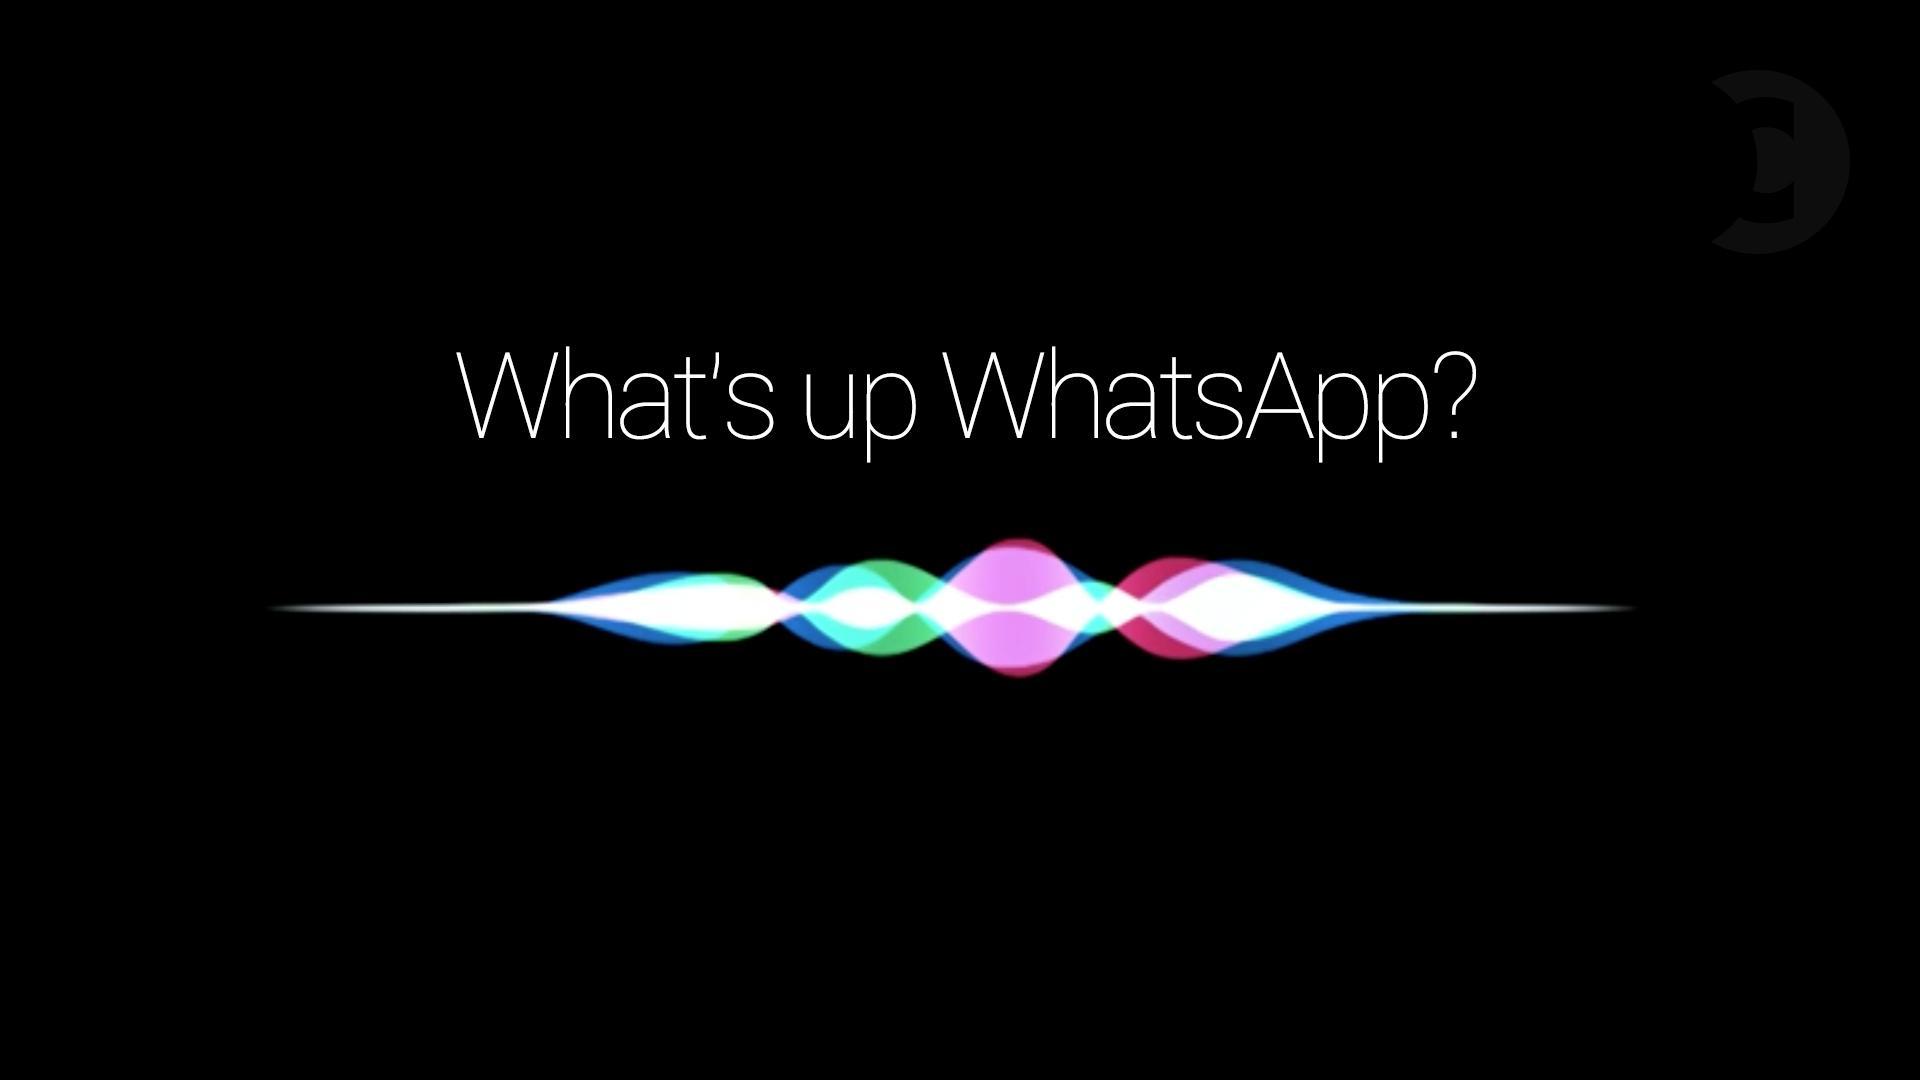 Siri ahora habla con WhatsApp